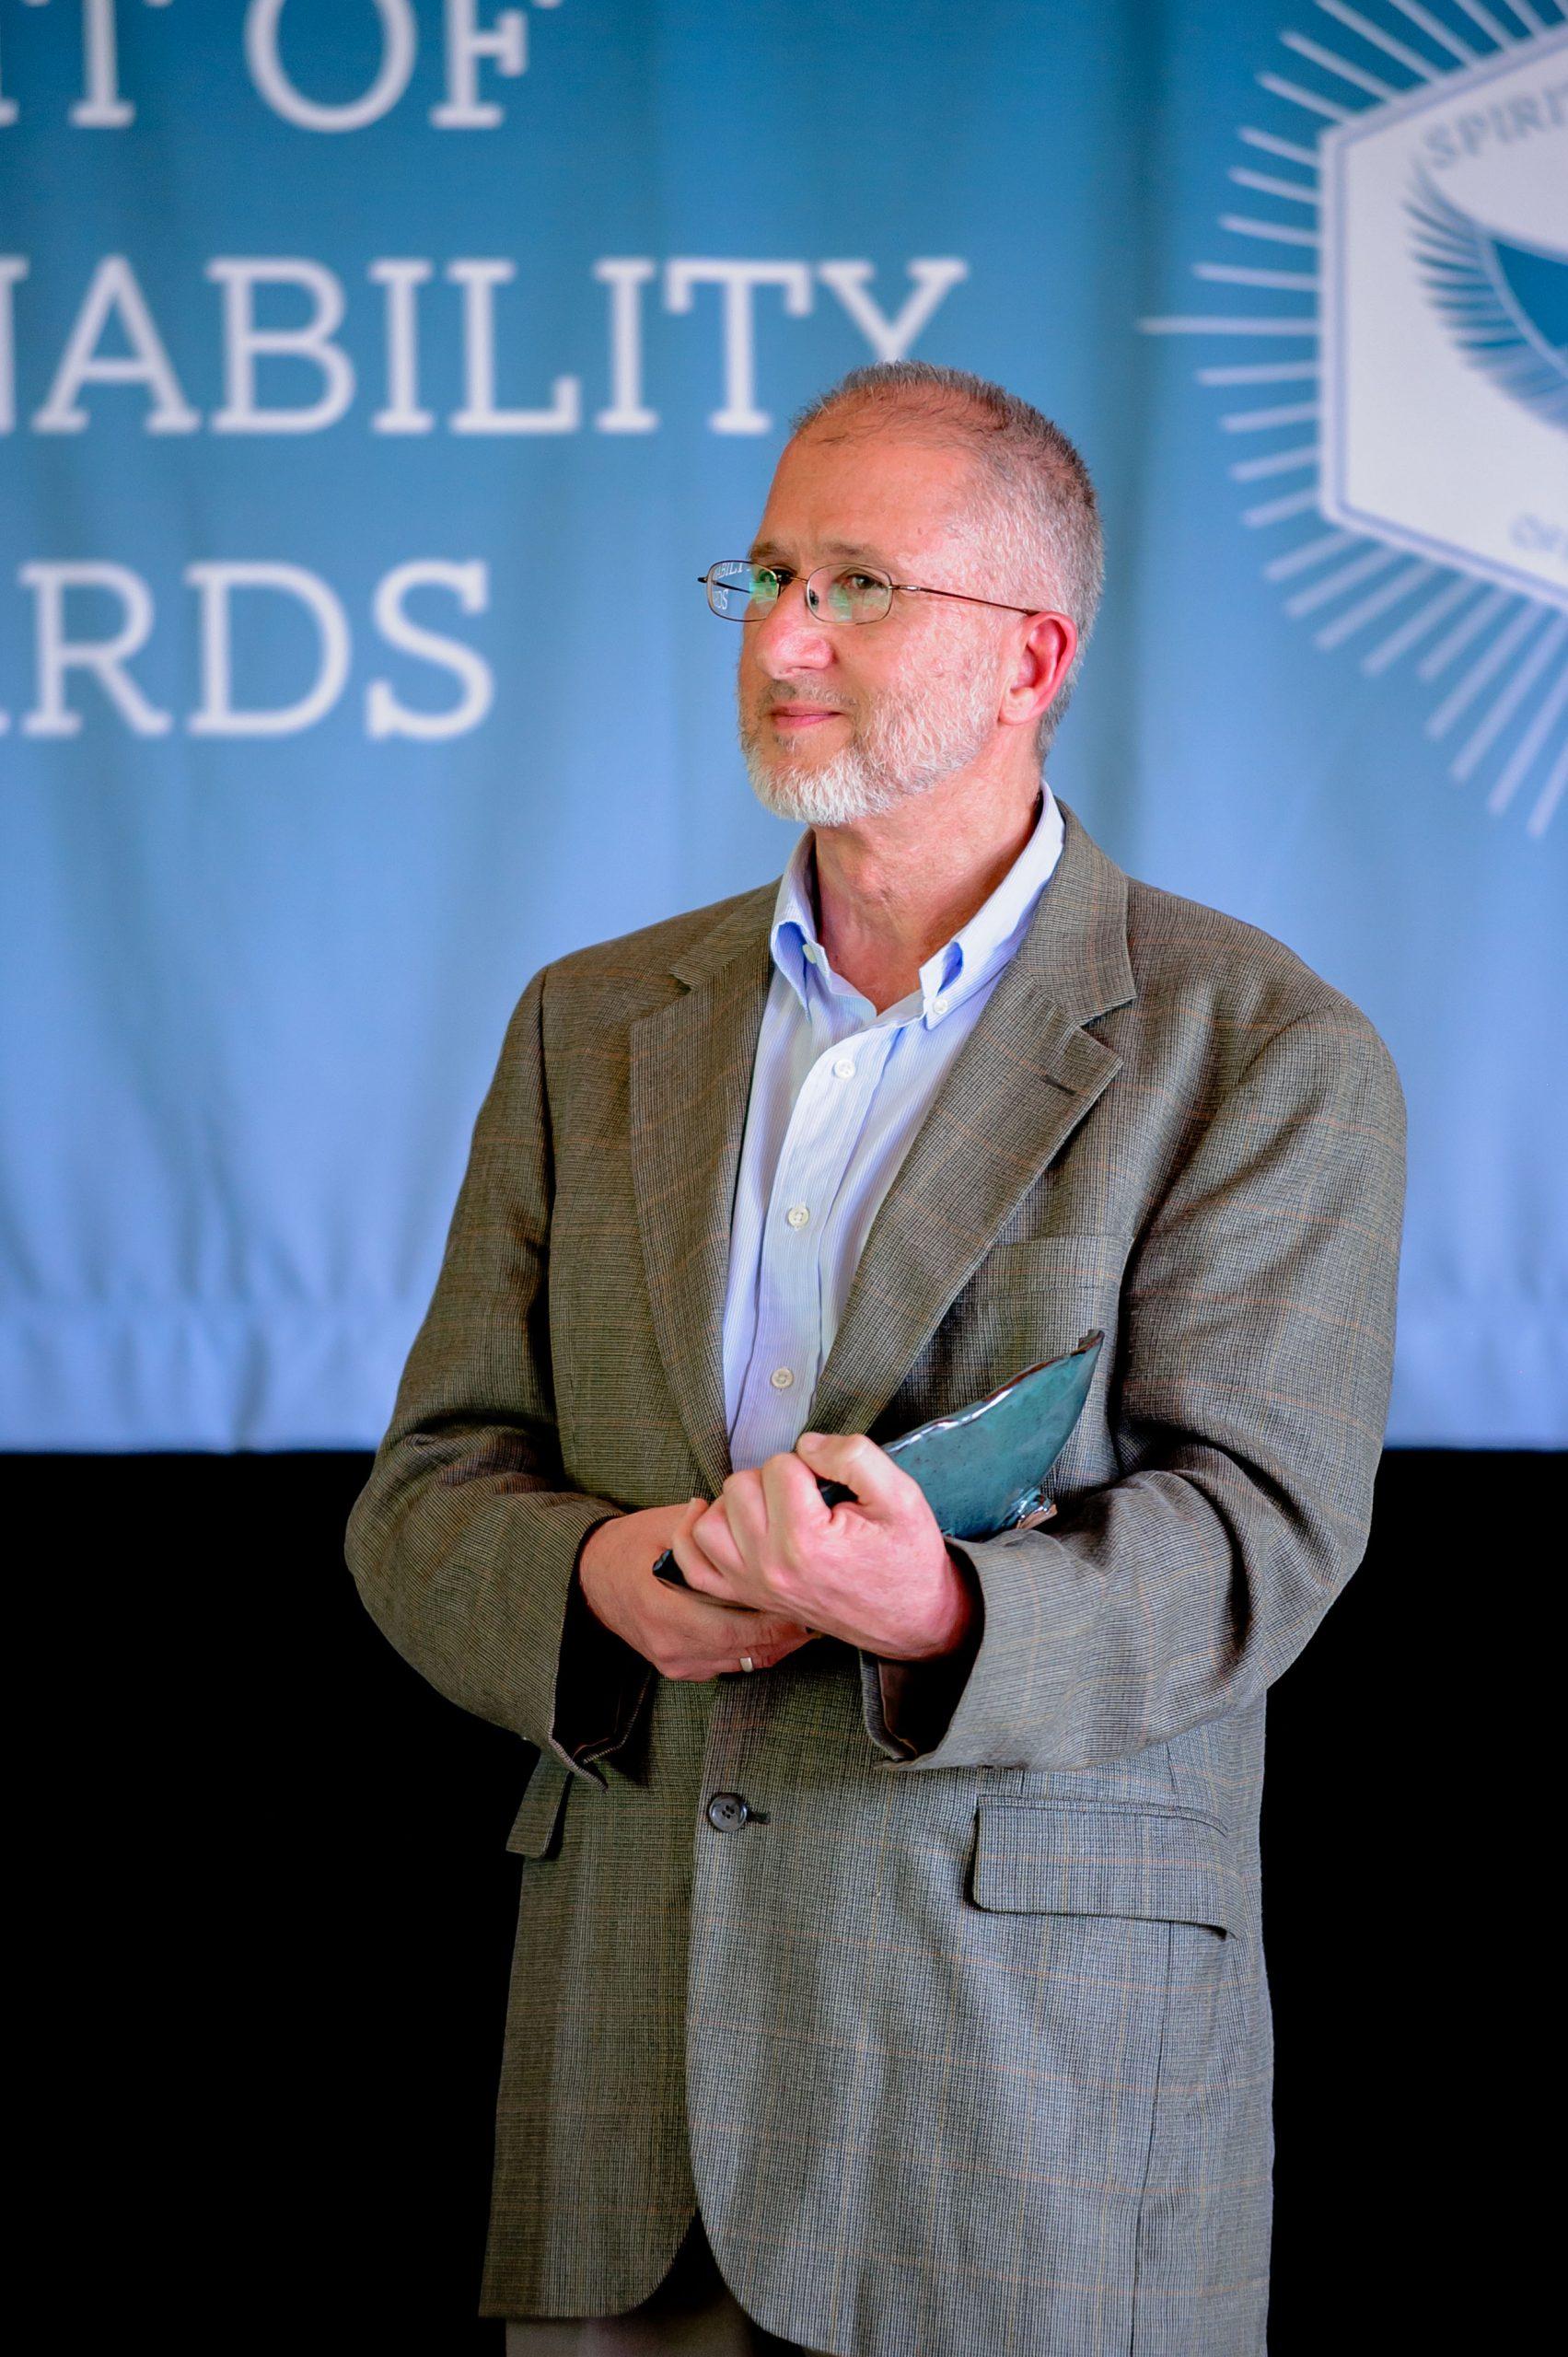 Mark Dougherty accepting his award.